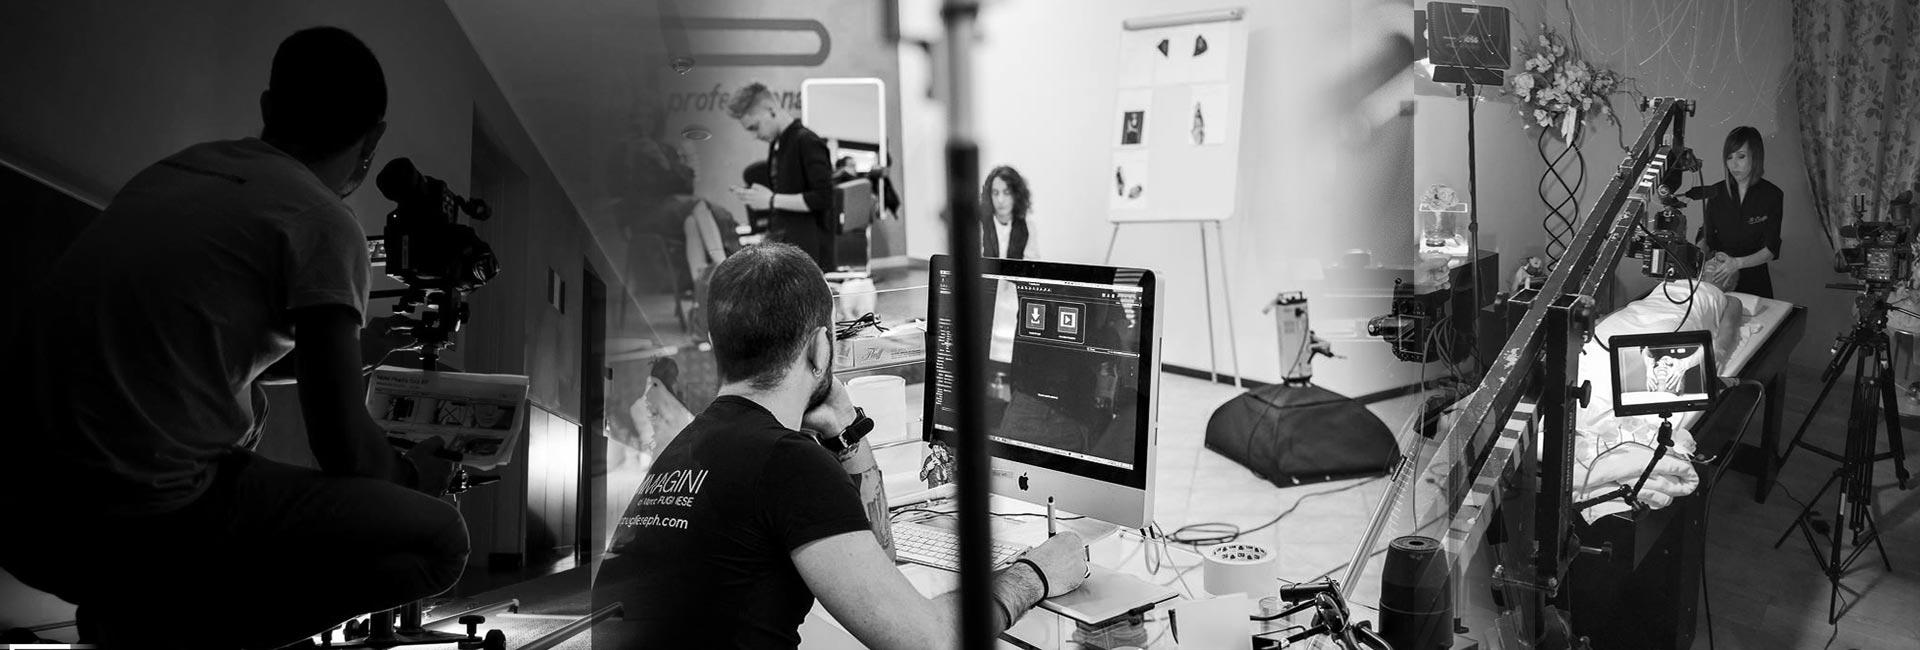 studio fotografico borgosesia vercelli videomaker